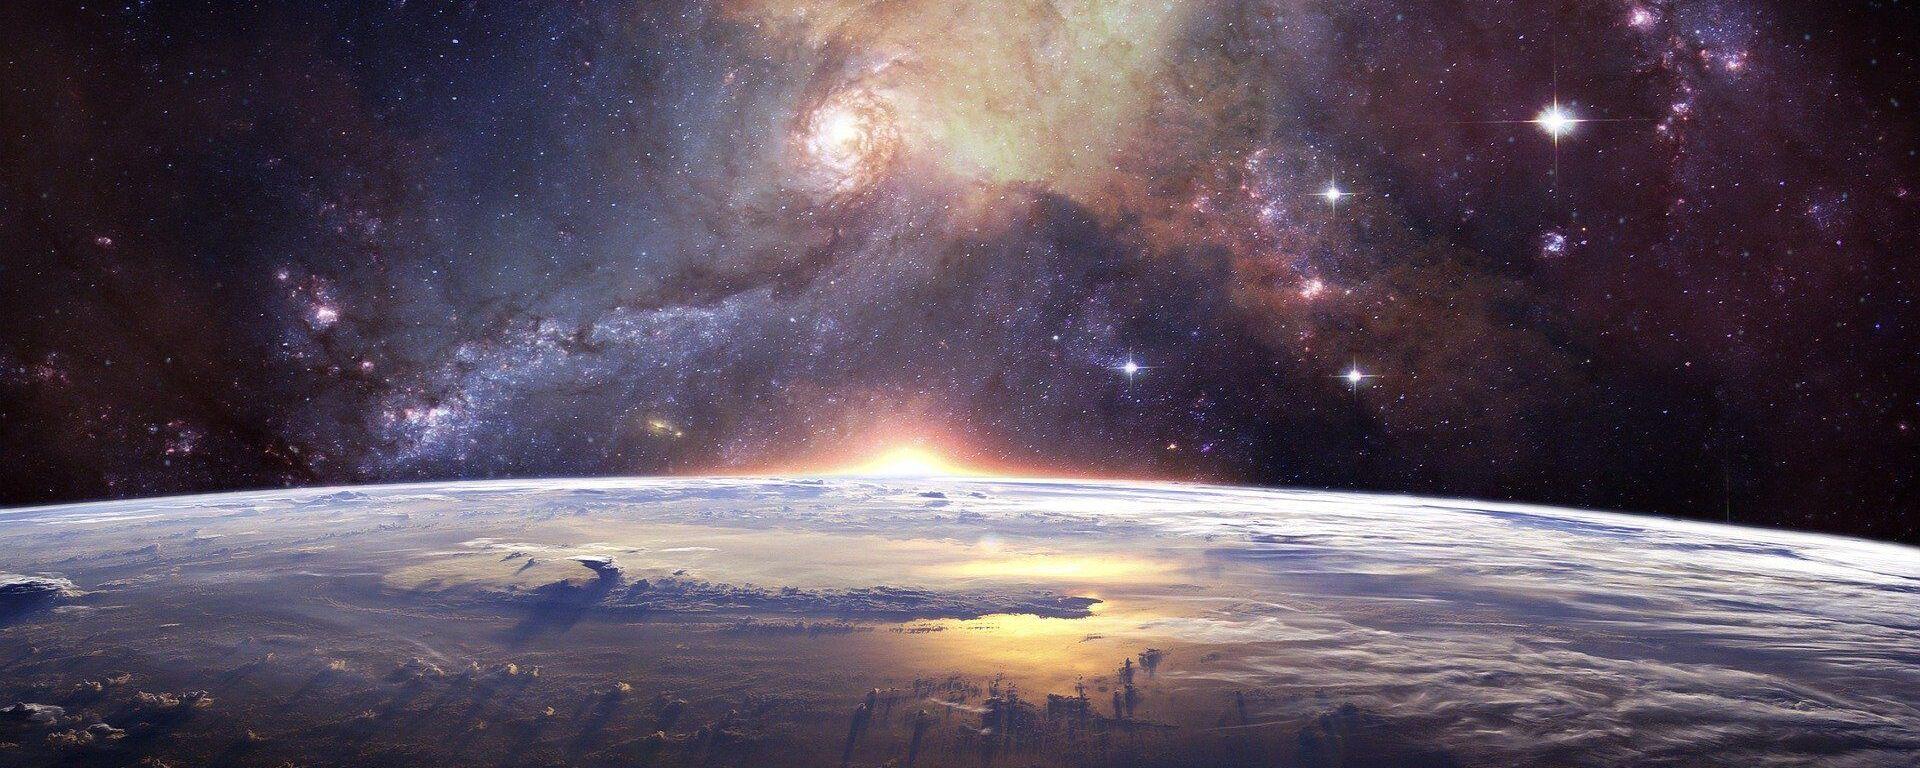 El Universo (imagen referencial) - Sputnik Mundo, 1920, 16.08.2021